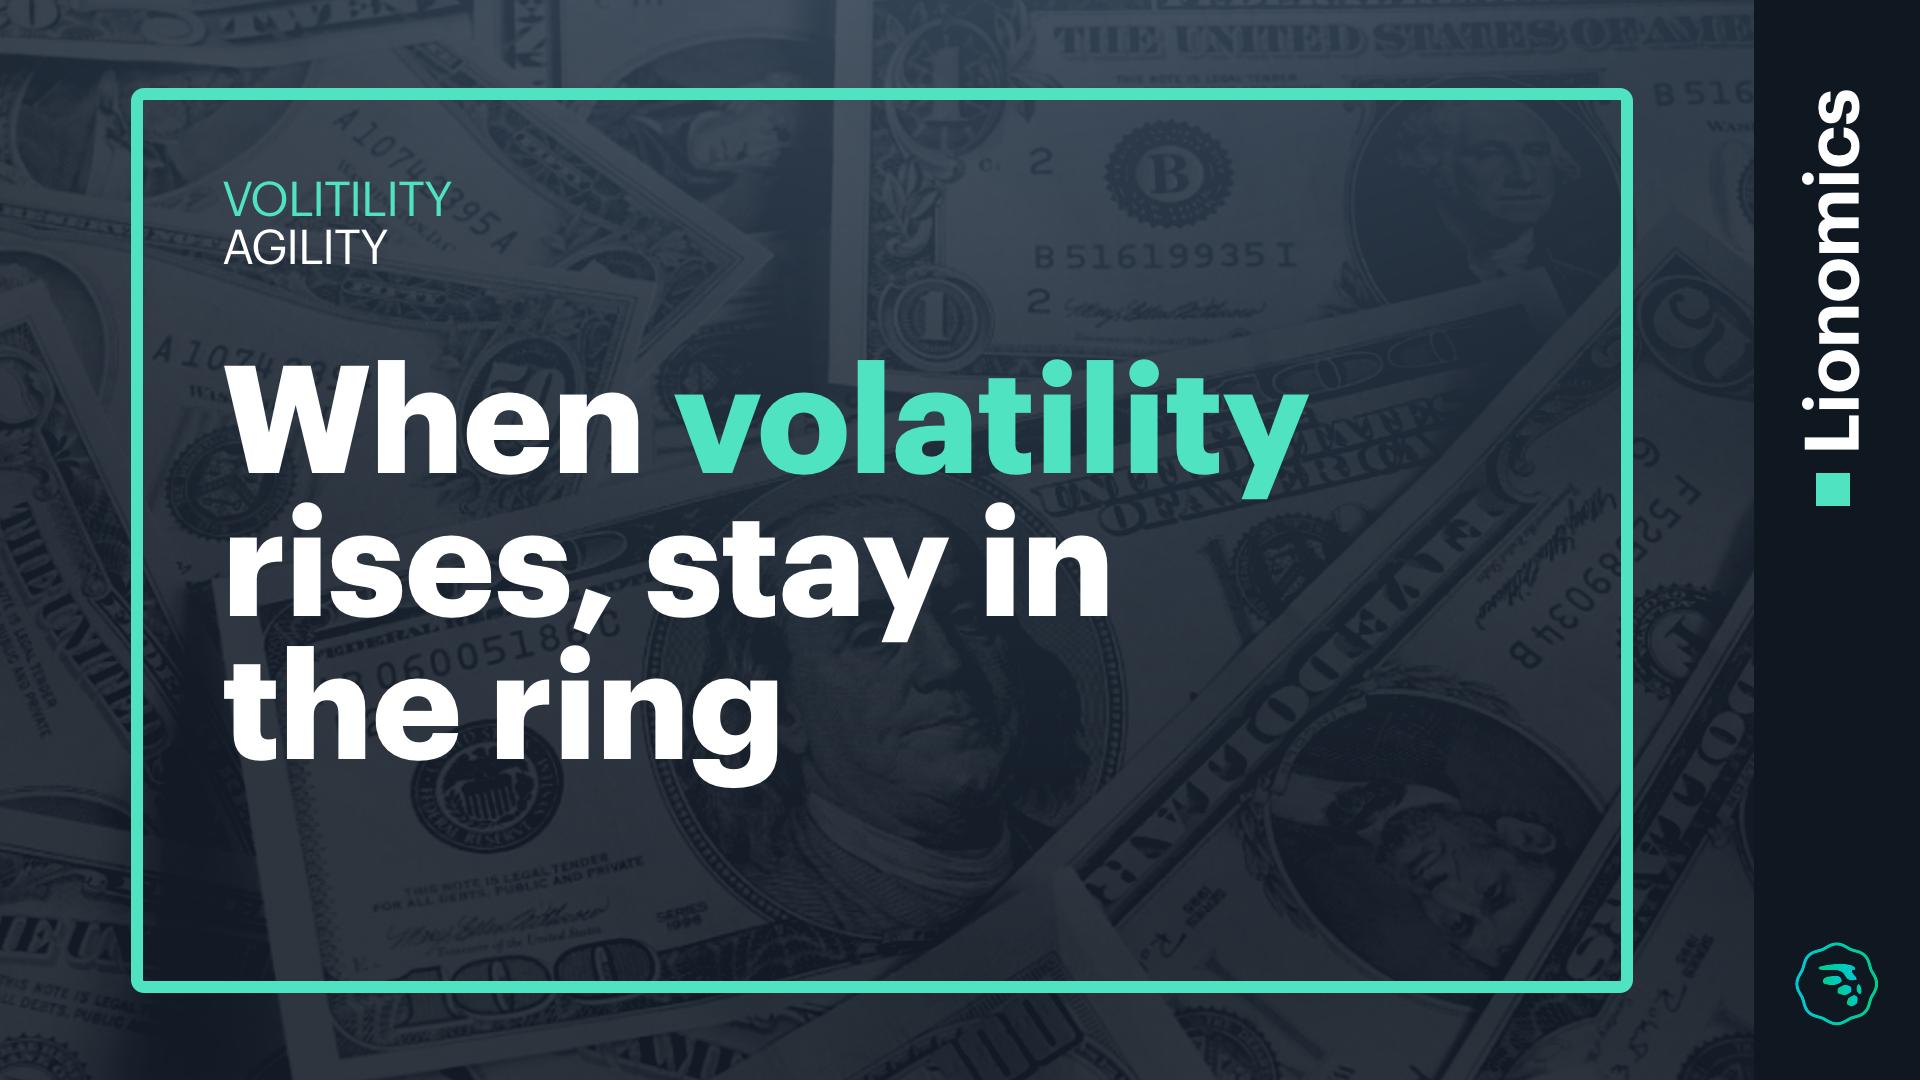 Lionomics VOLITILITY AGILITY BLOG Whats Volatility 11262018